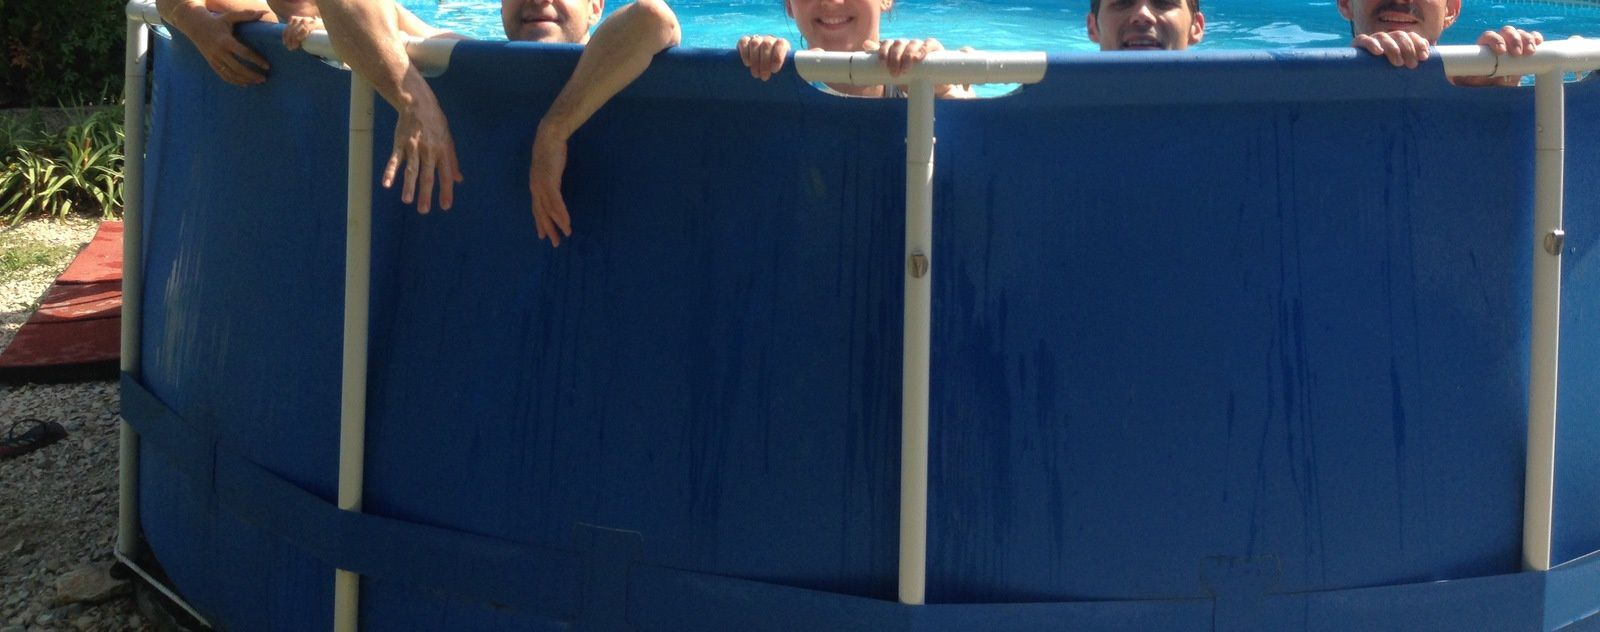 Avoir une belle brochette dans la piscine